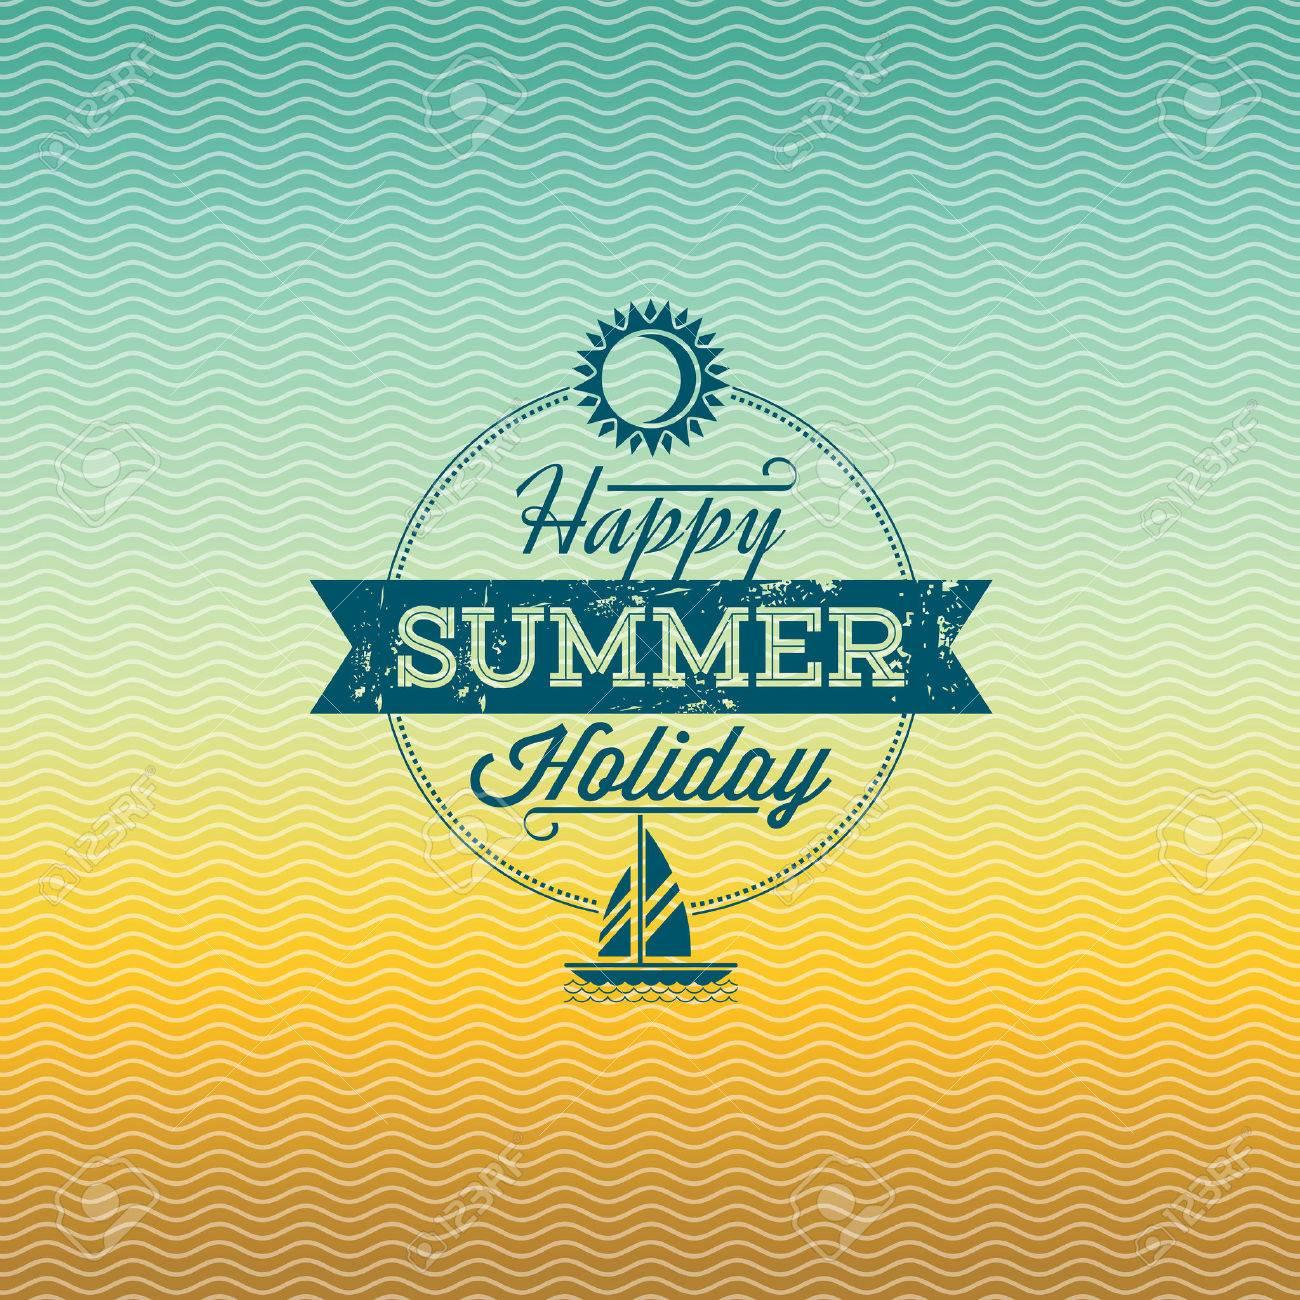 Summer holidays illustration  summer background Standard-Bild - 39943161